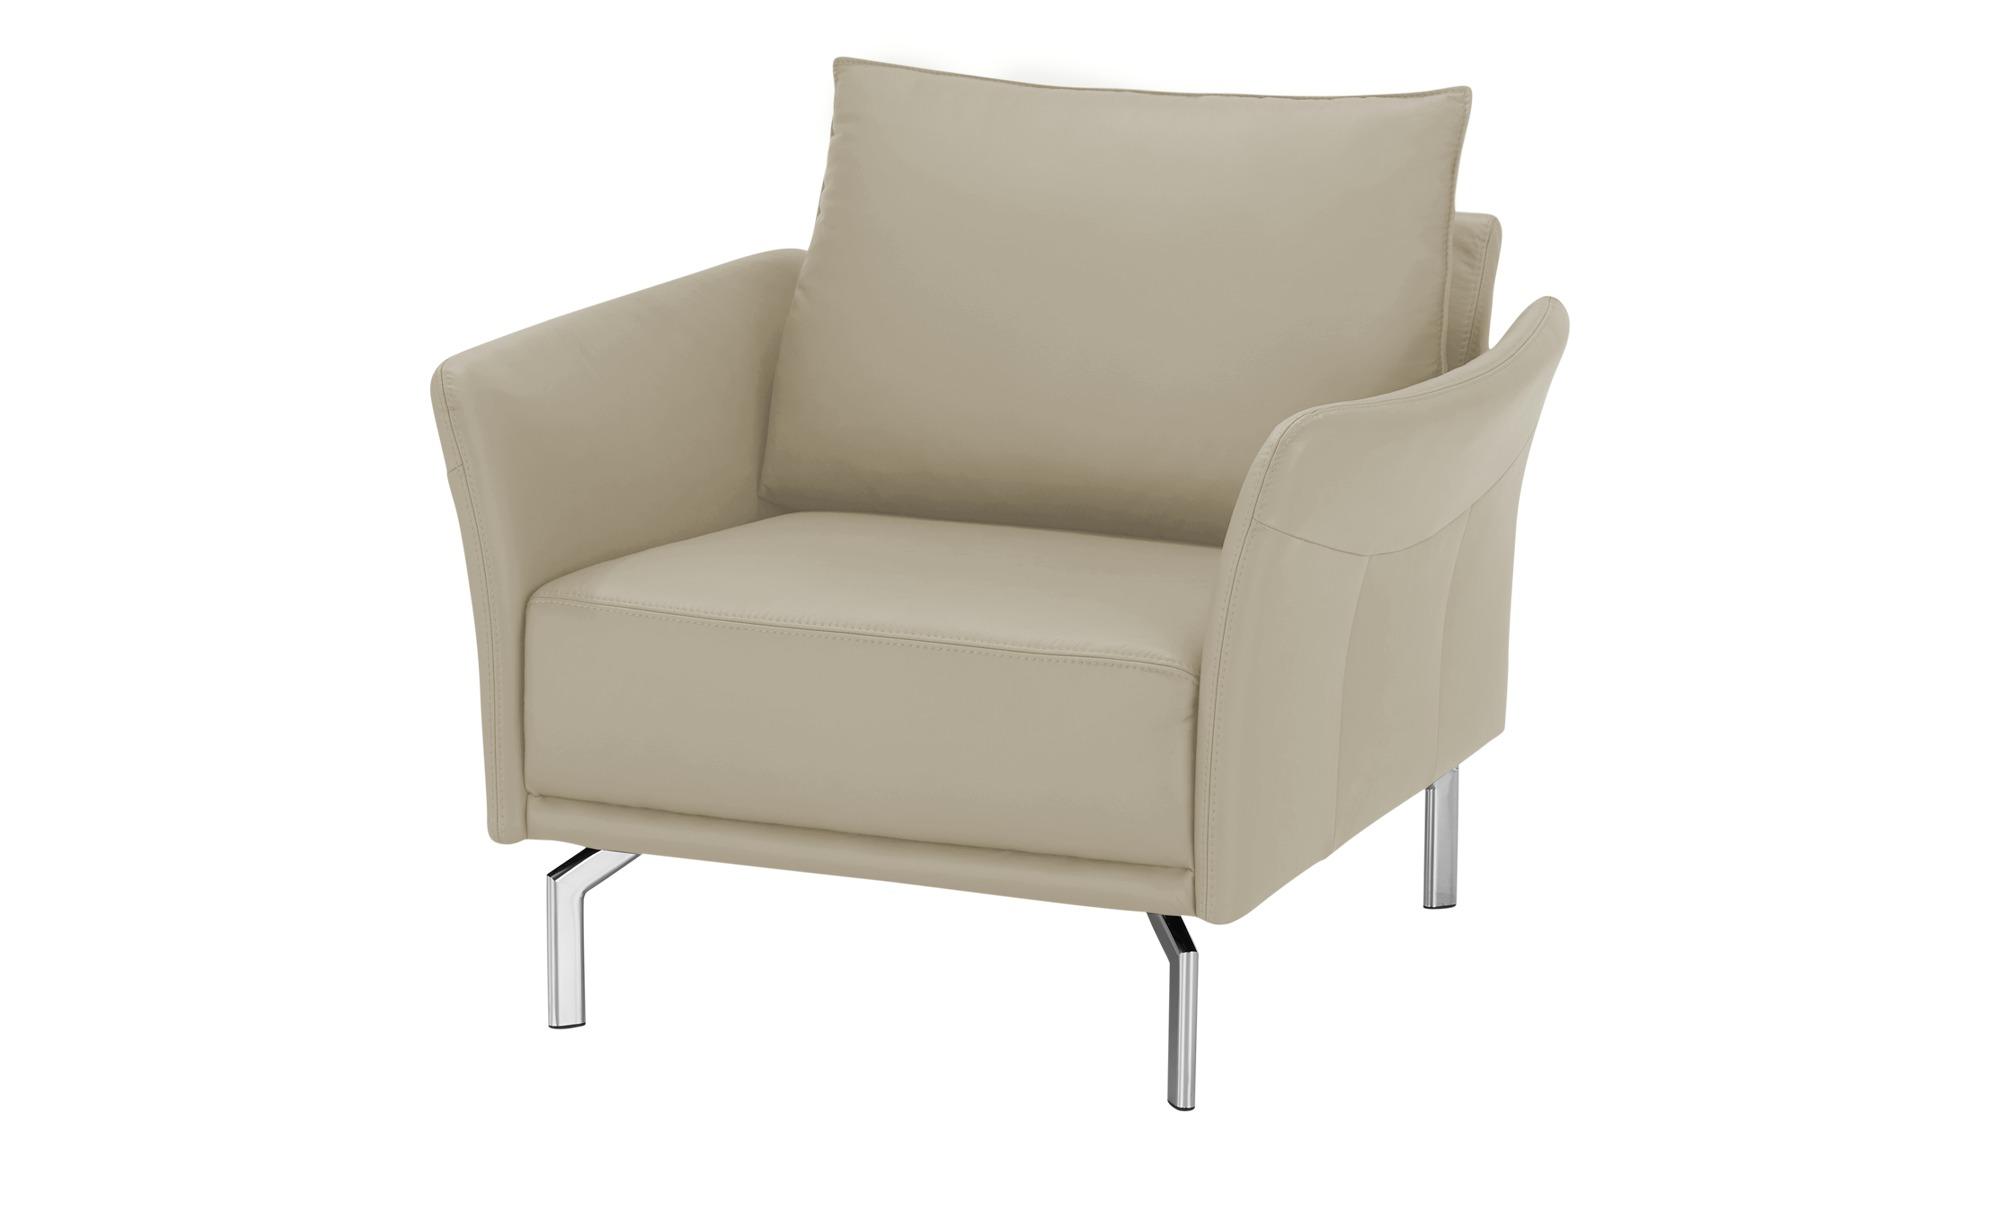 SOHO Sessel  Yamila ¦ beige ¦ Maße (cm): B: 102 H: 90 T: 81 Polstermöbel > Sessel > Ledersessel - Höffner